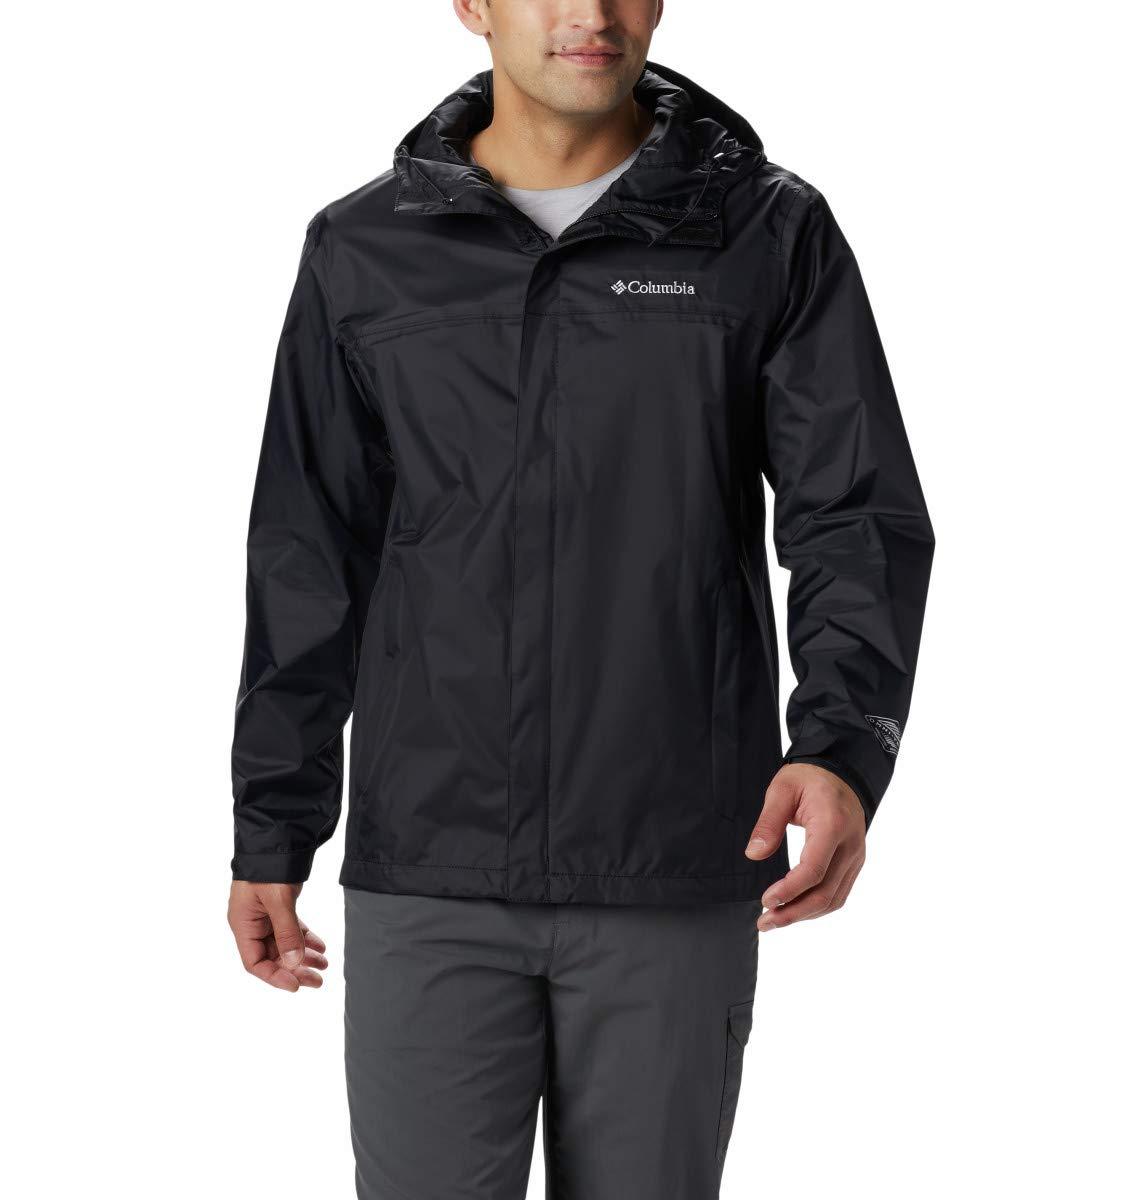 Columbia Men's Tall Size Watertight II Waterproof, Breathable Rain Jacket, Black, 3XT by Columbia